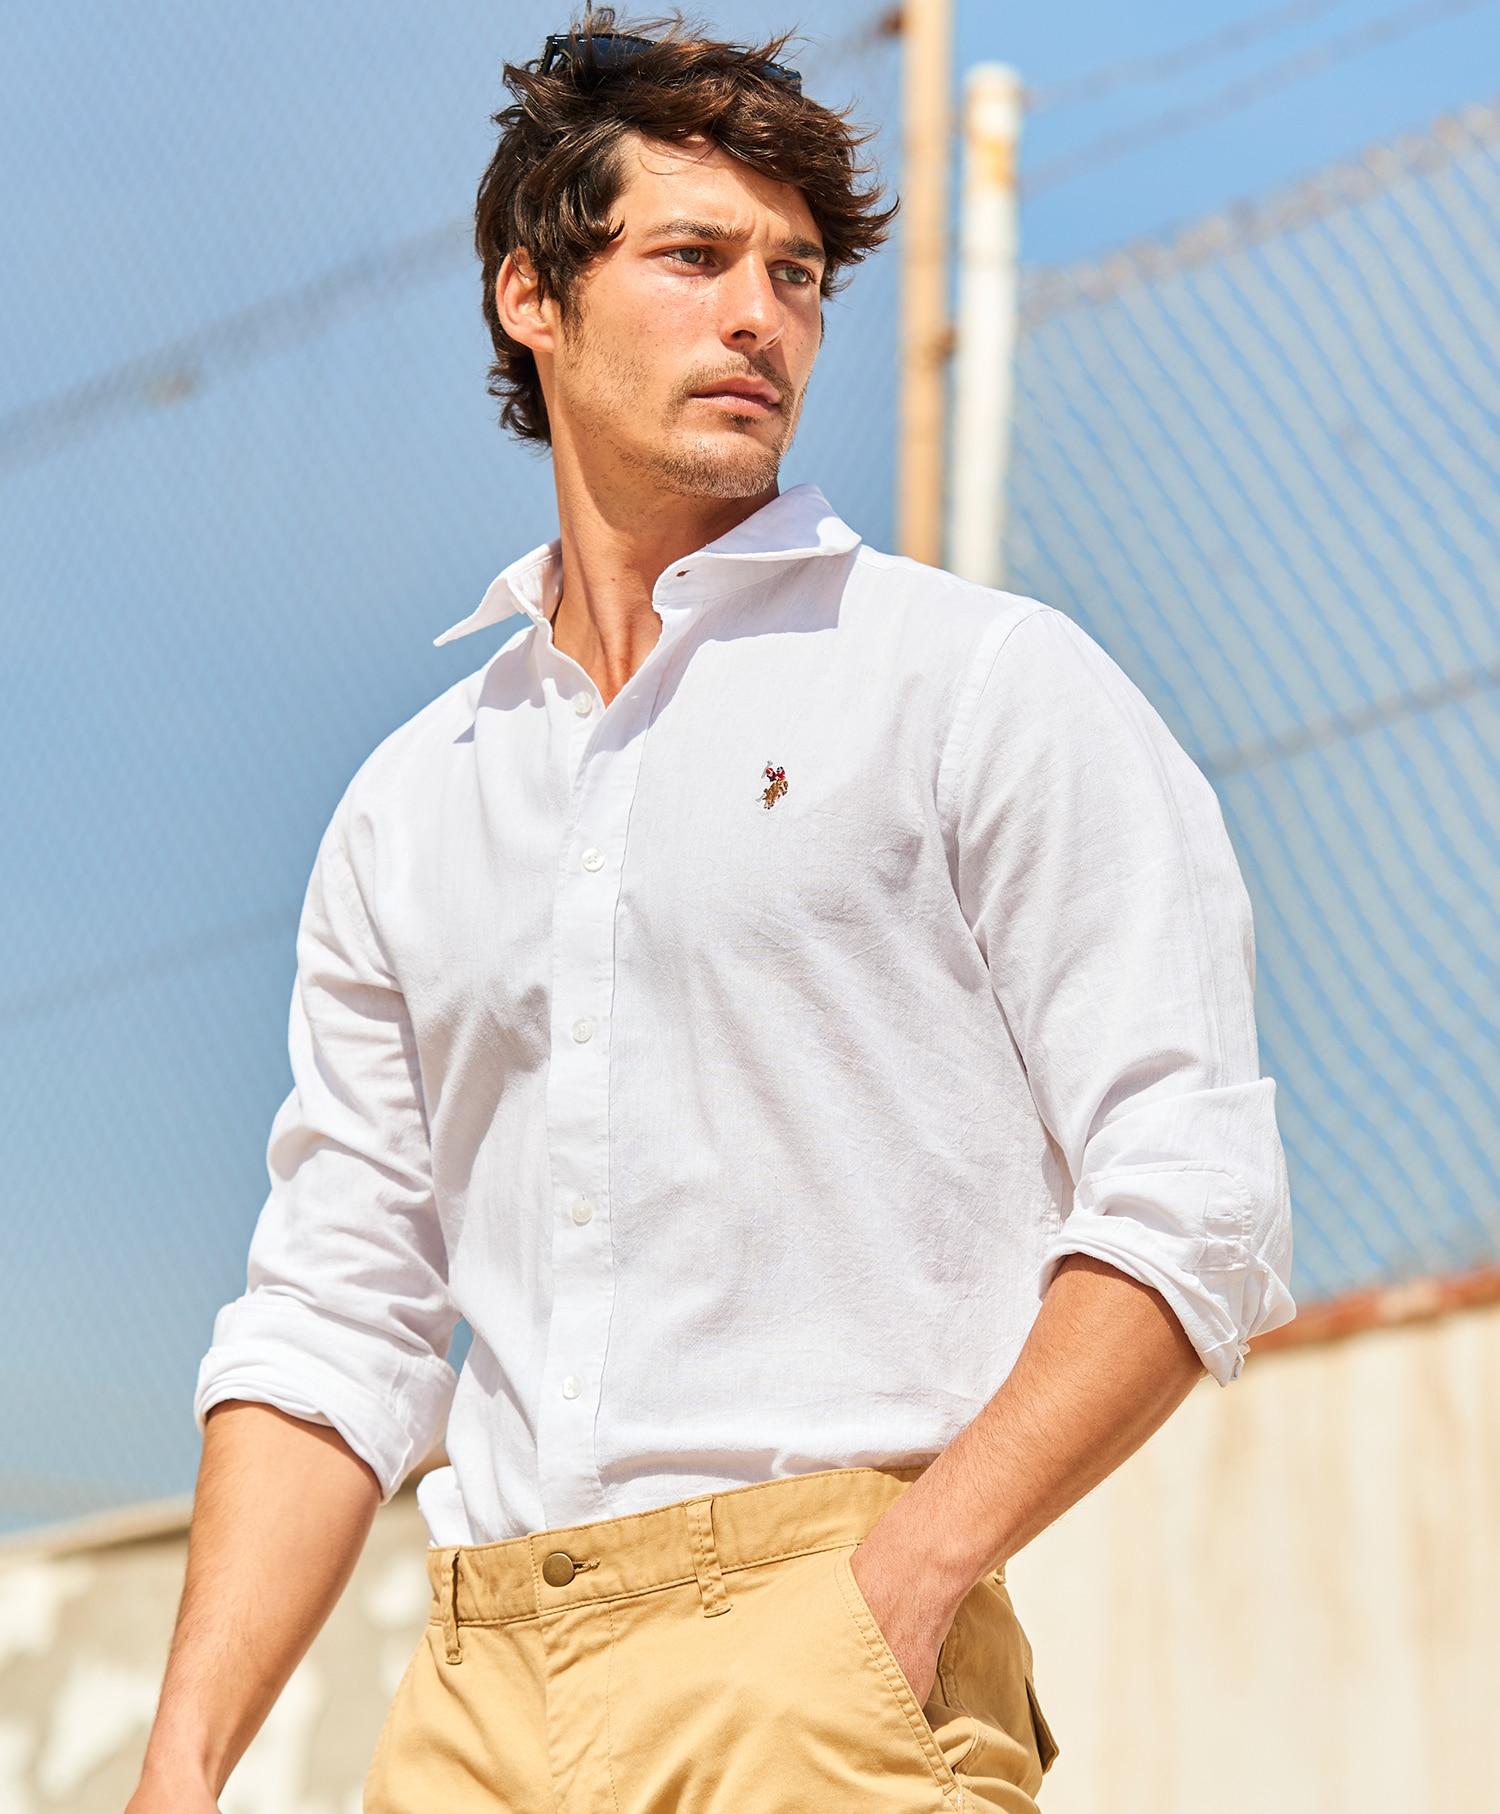 U.S Polo Bolt Shirt